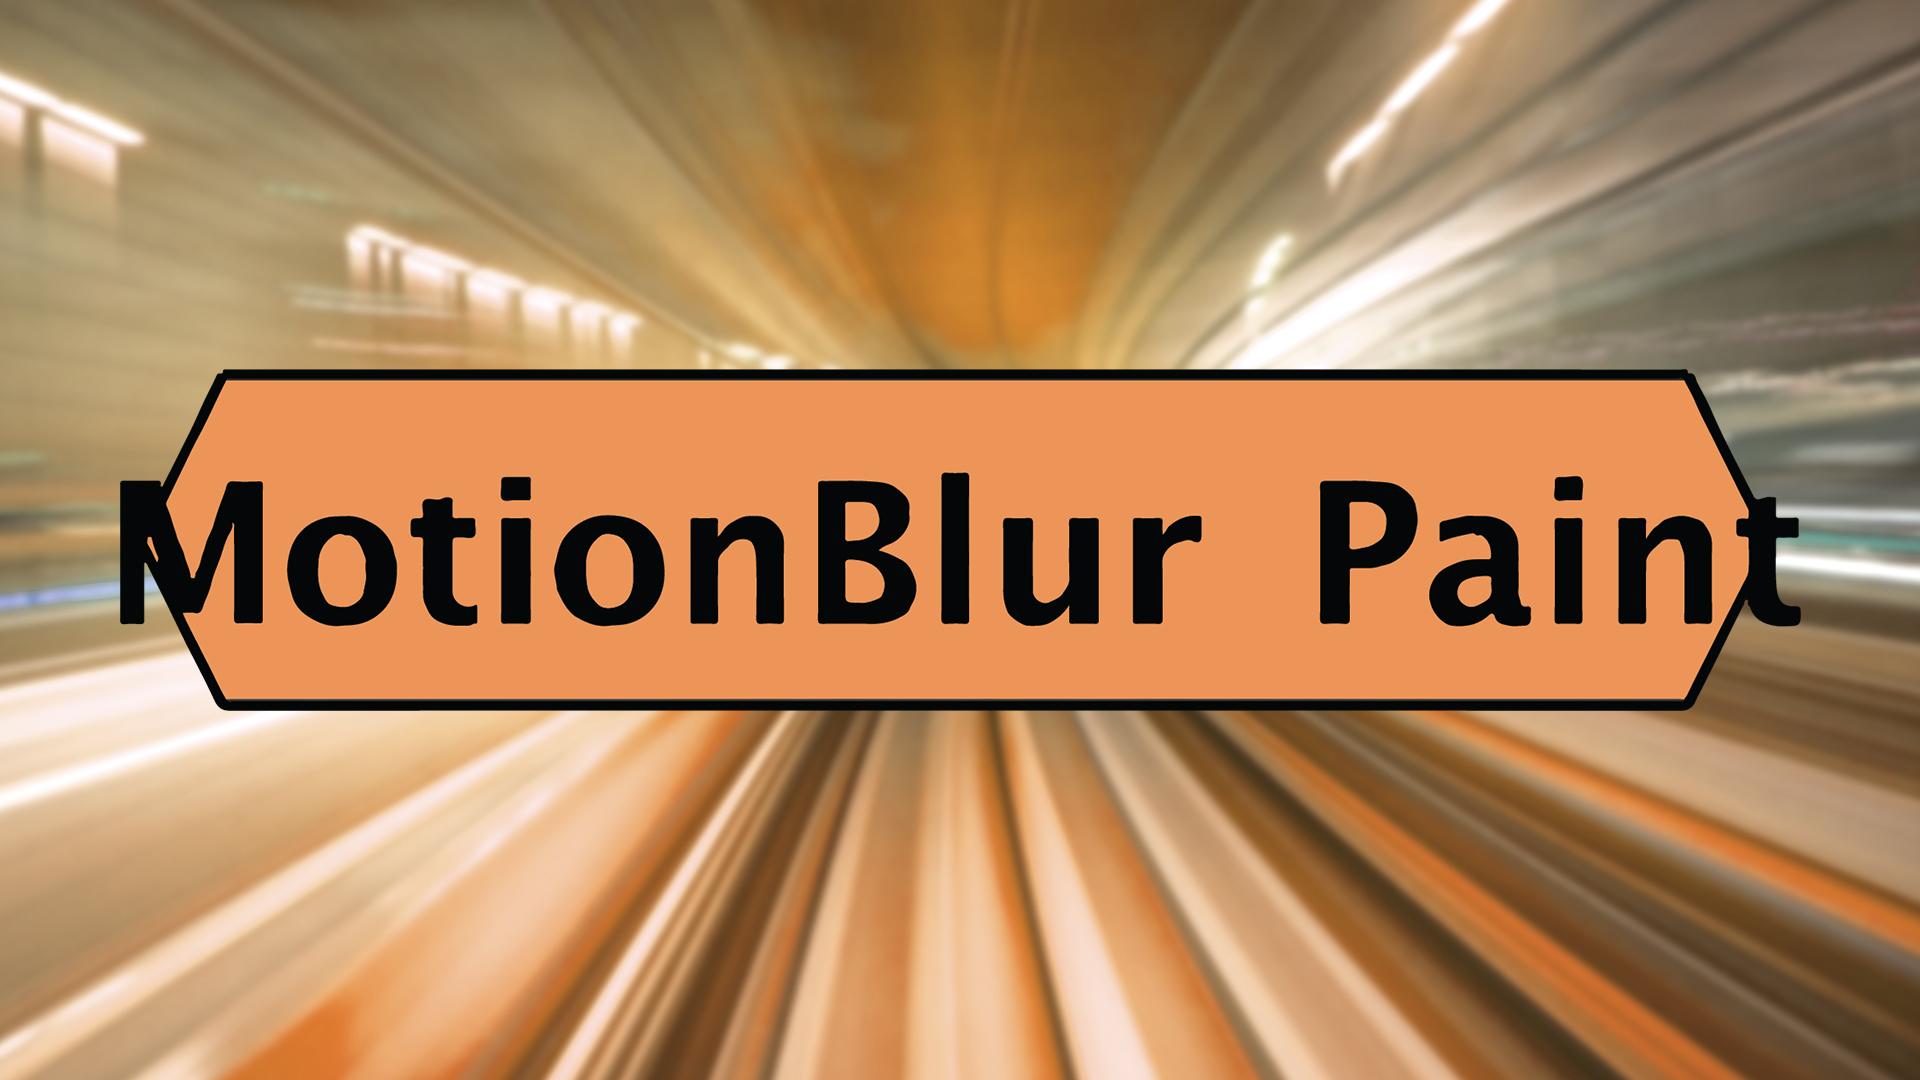 Motion-blur_paint.jpg